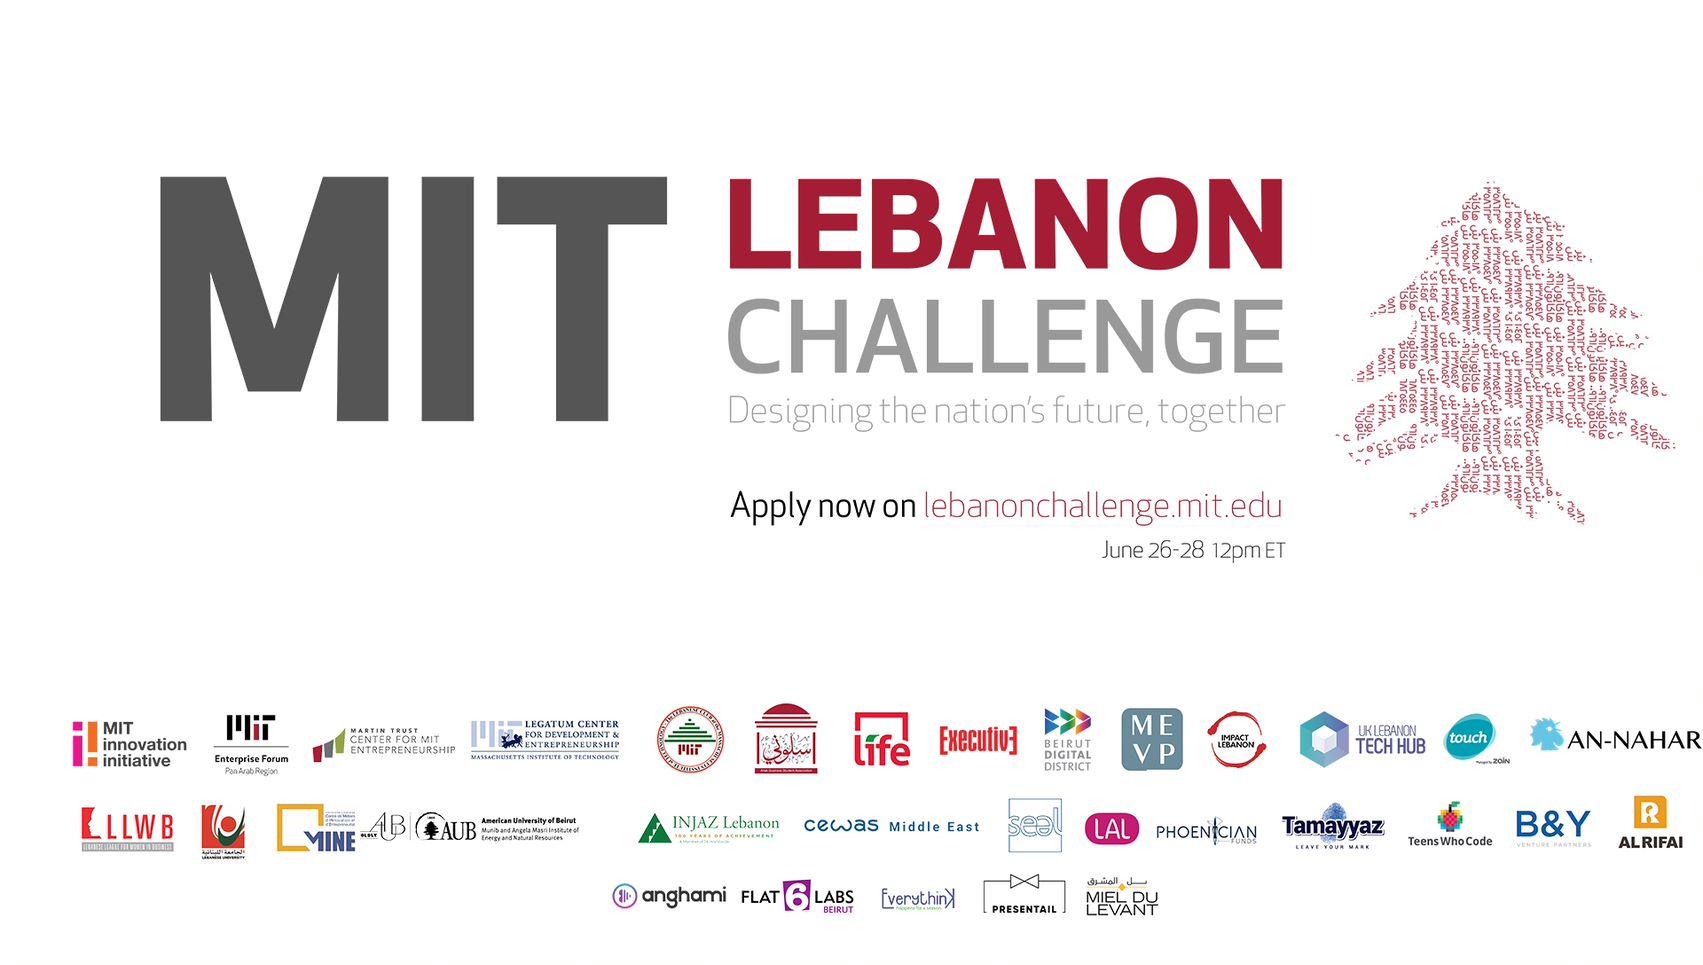 MIT Lebanon Challenge